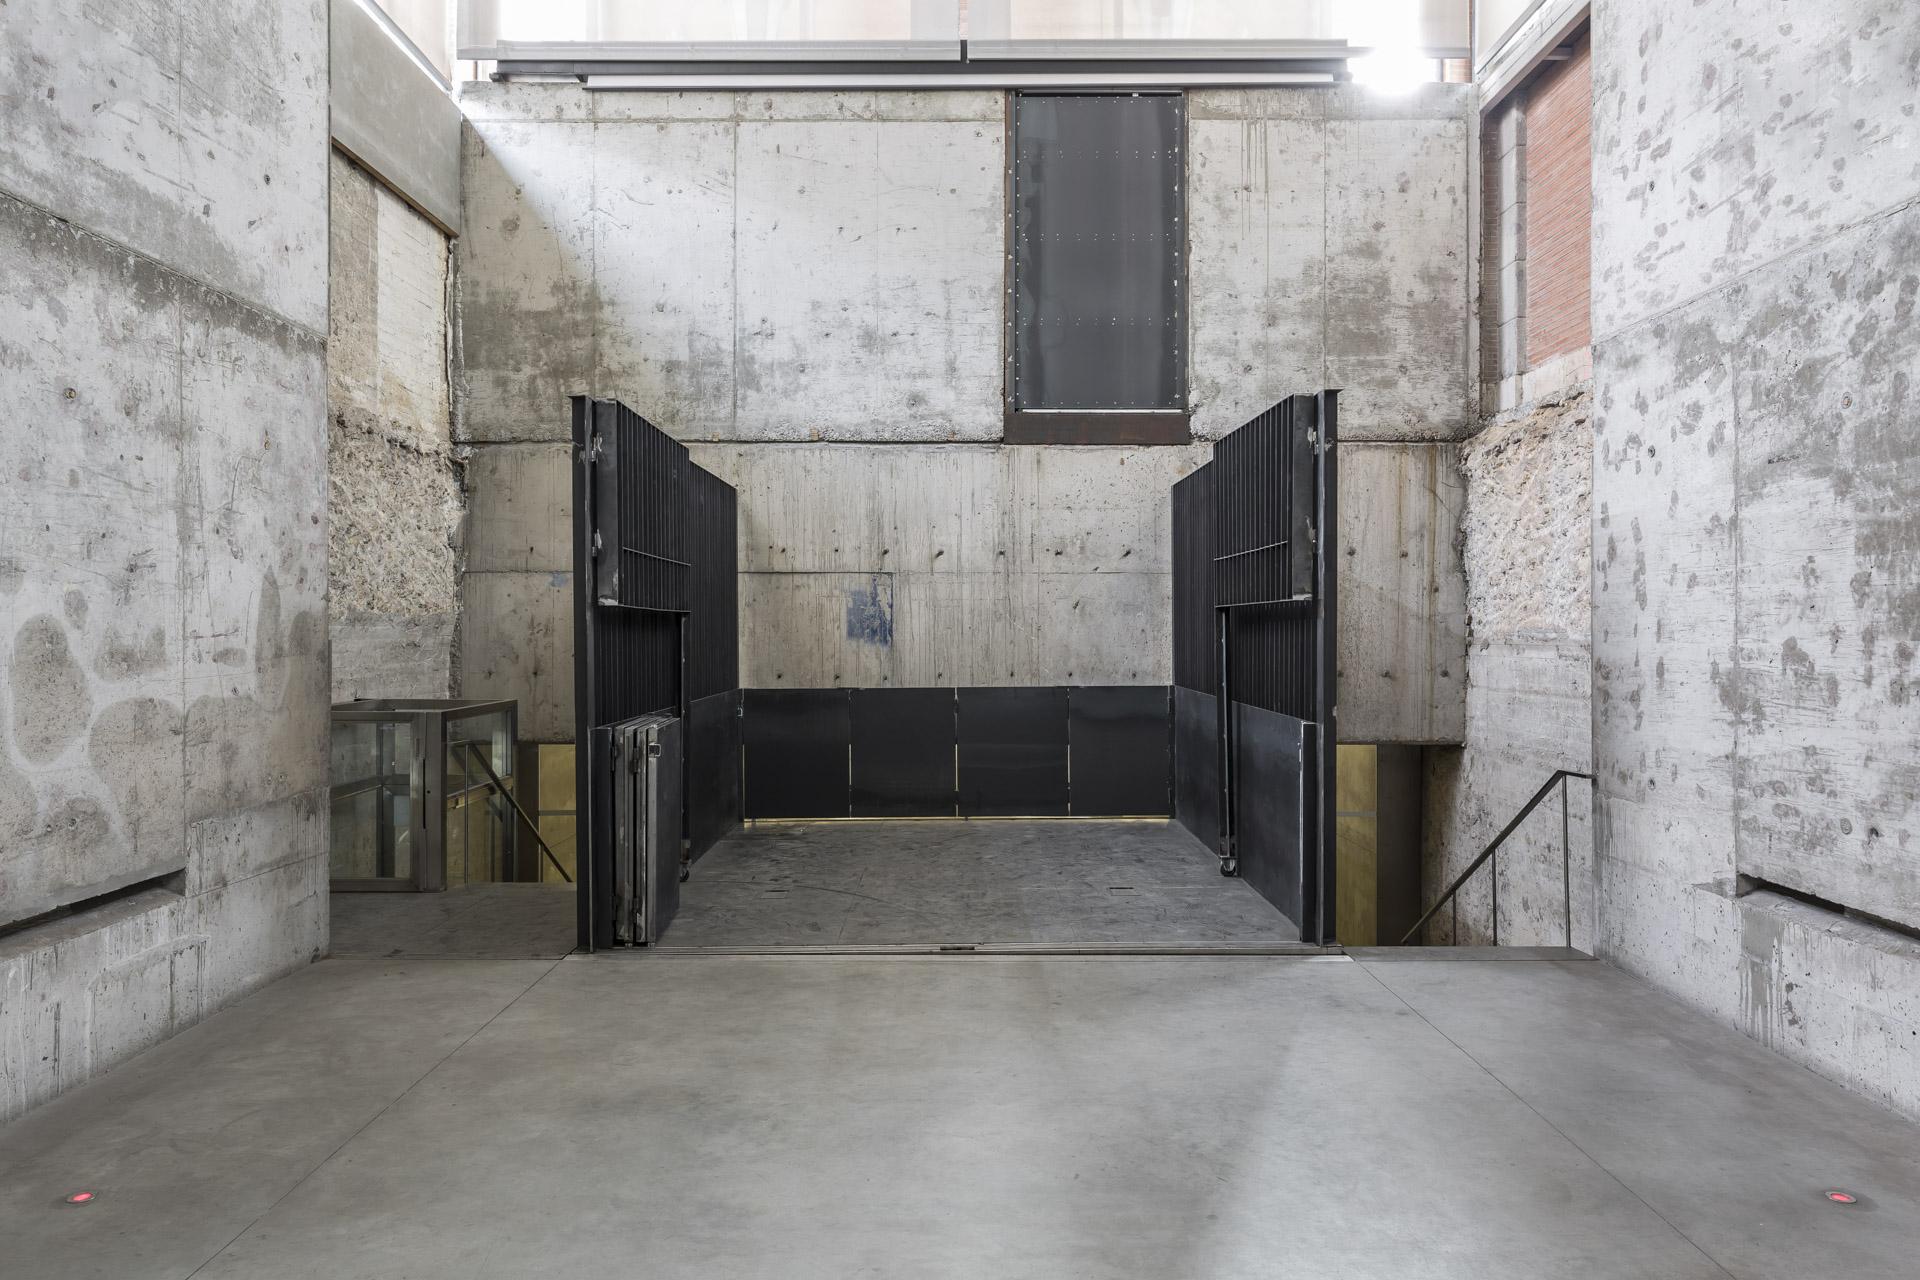 fotografia-arquitectura-madrid-nuevos-ministerios-elorza-german-cabo-19